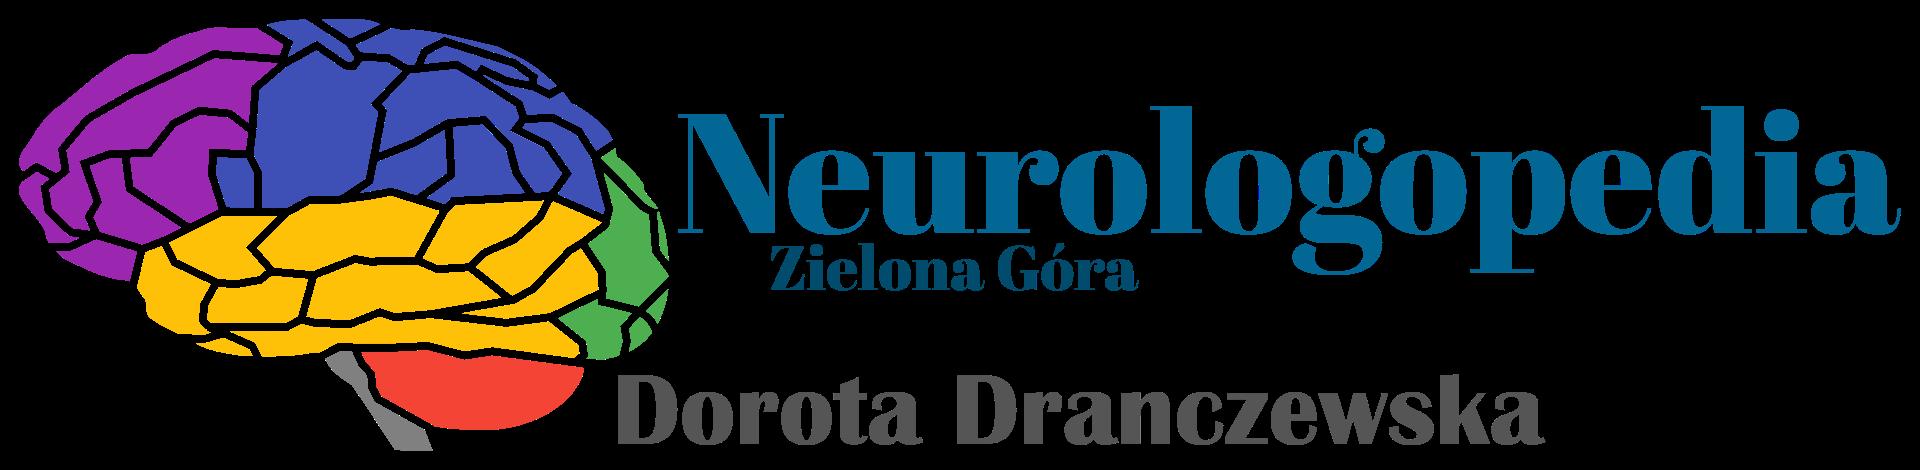 Neurologopedia Zielona Góra